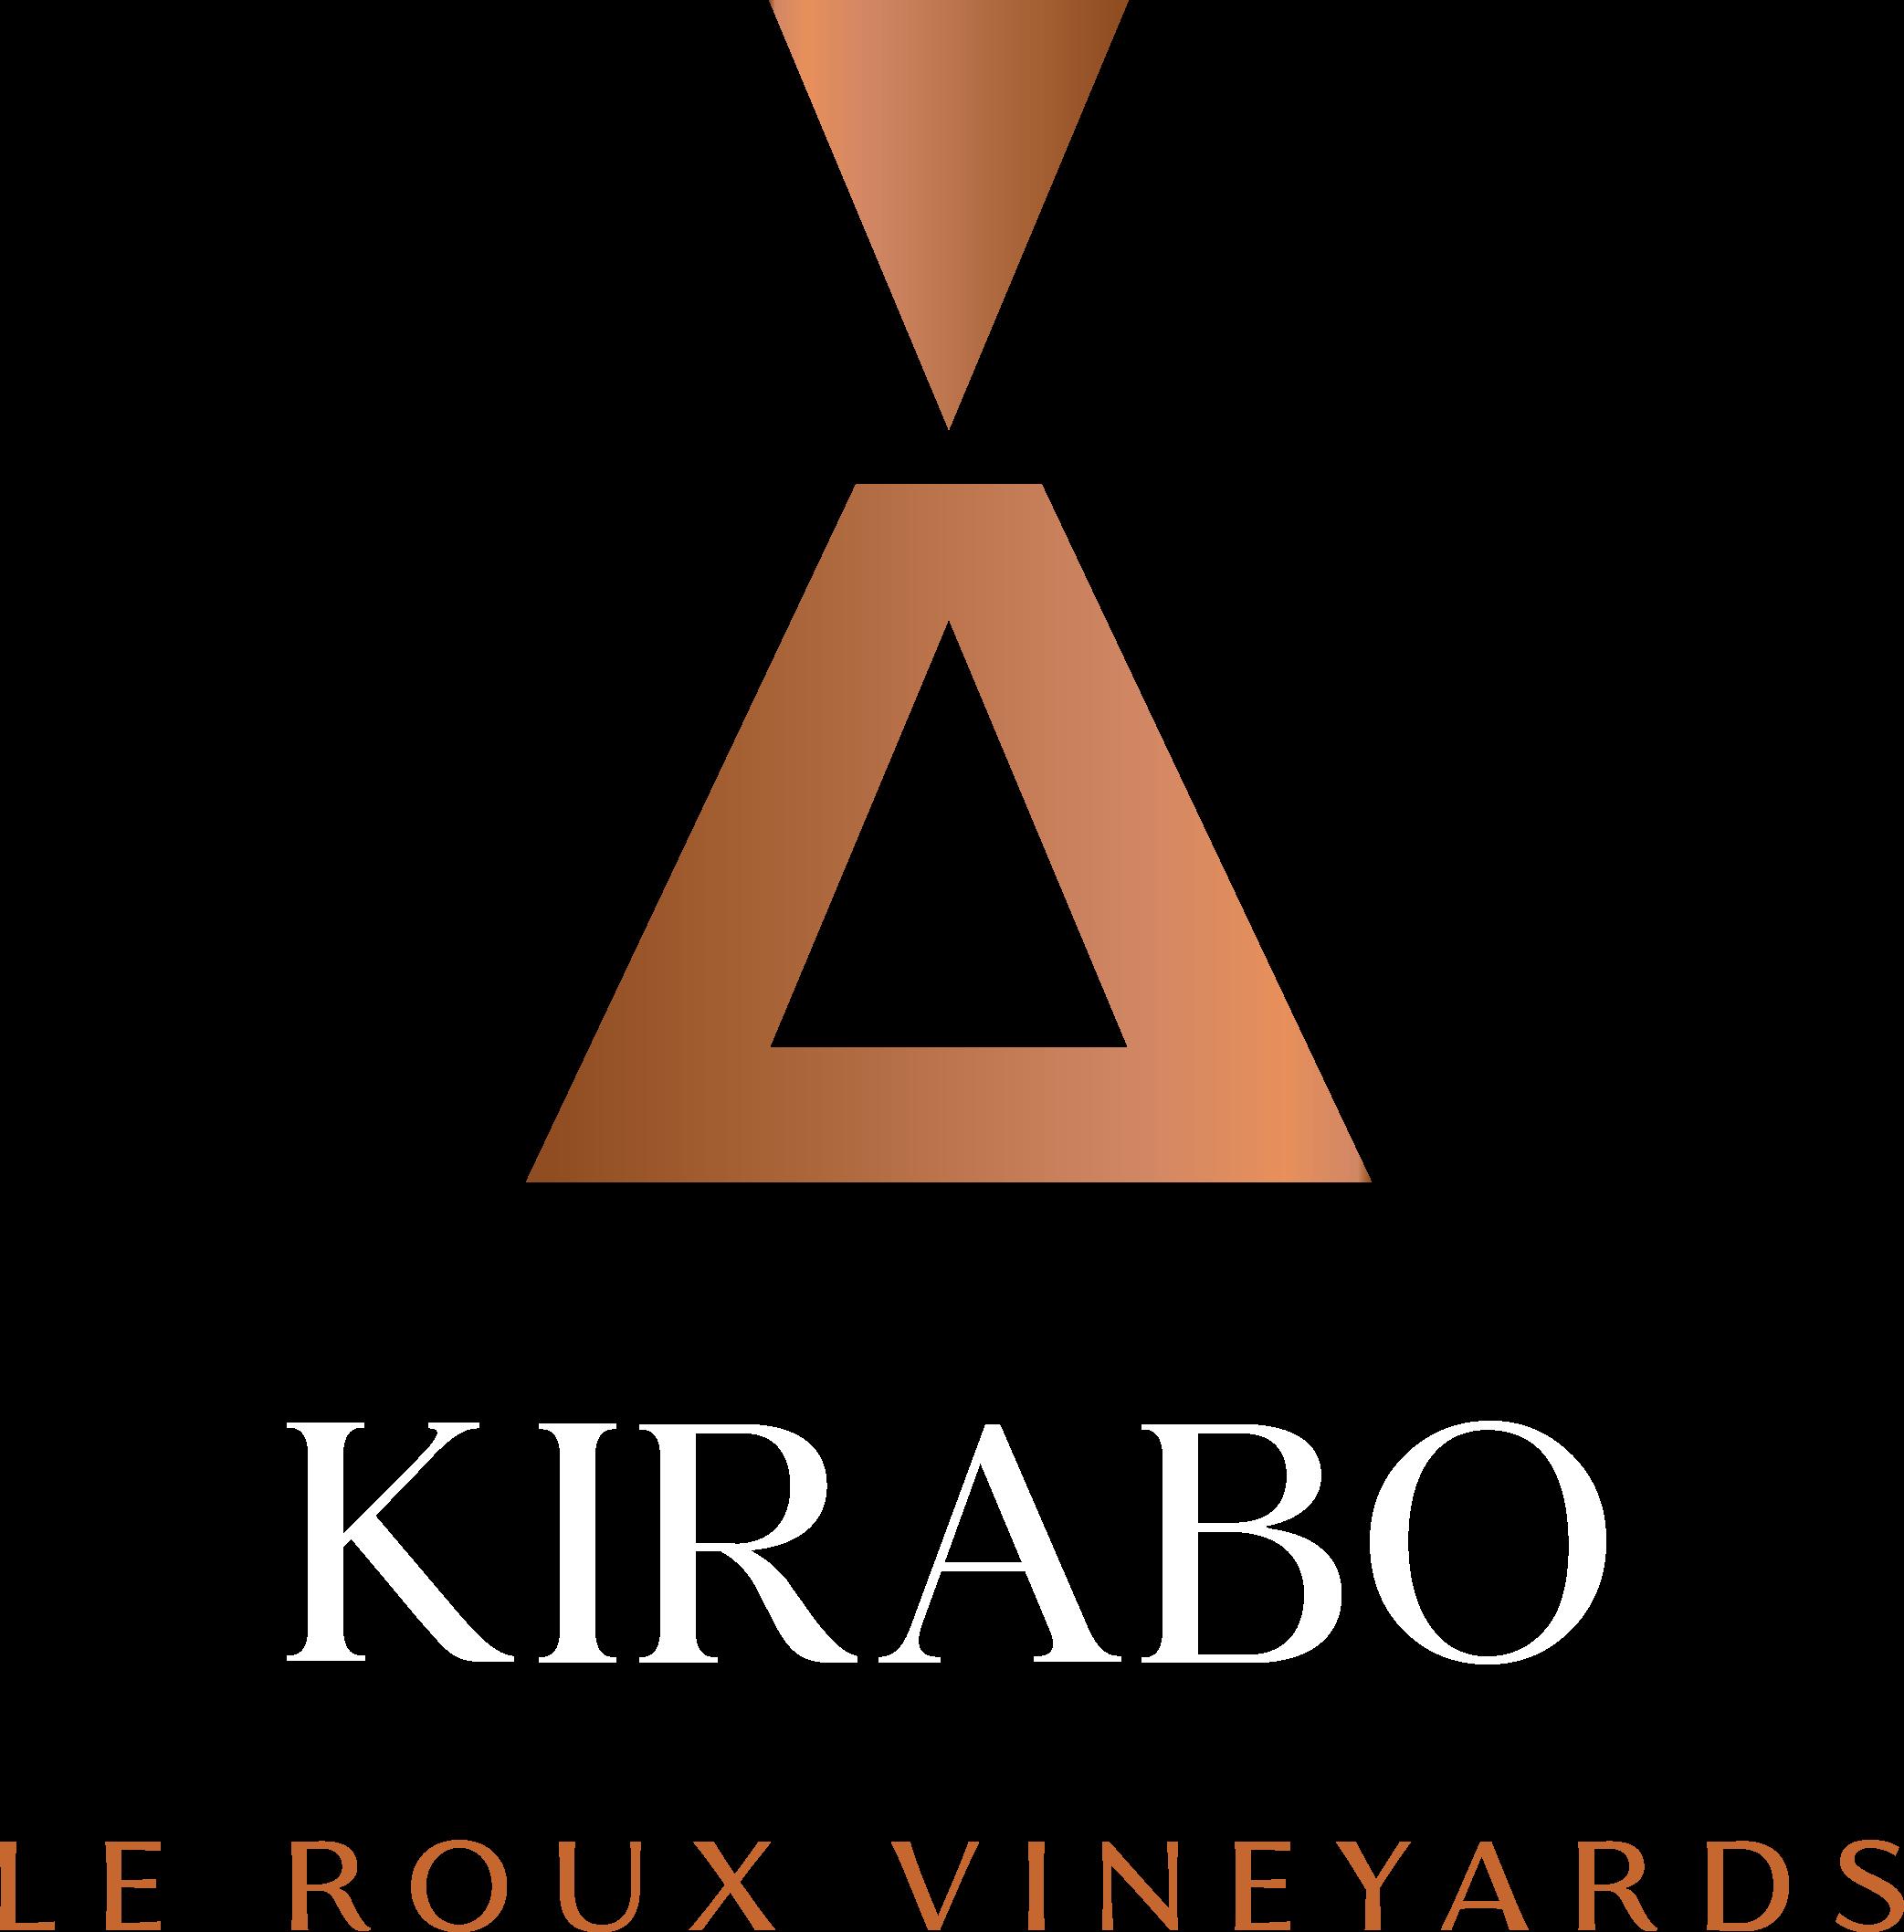 Kirabo Le Roux Vineyards Copper Logo